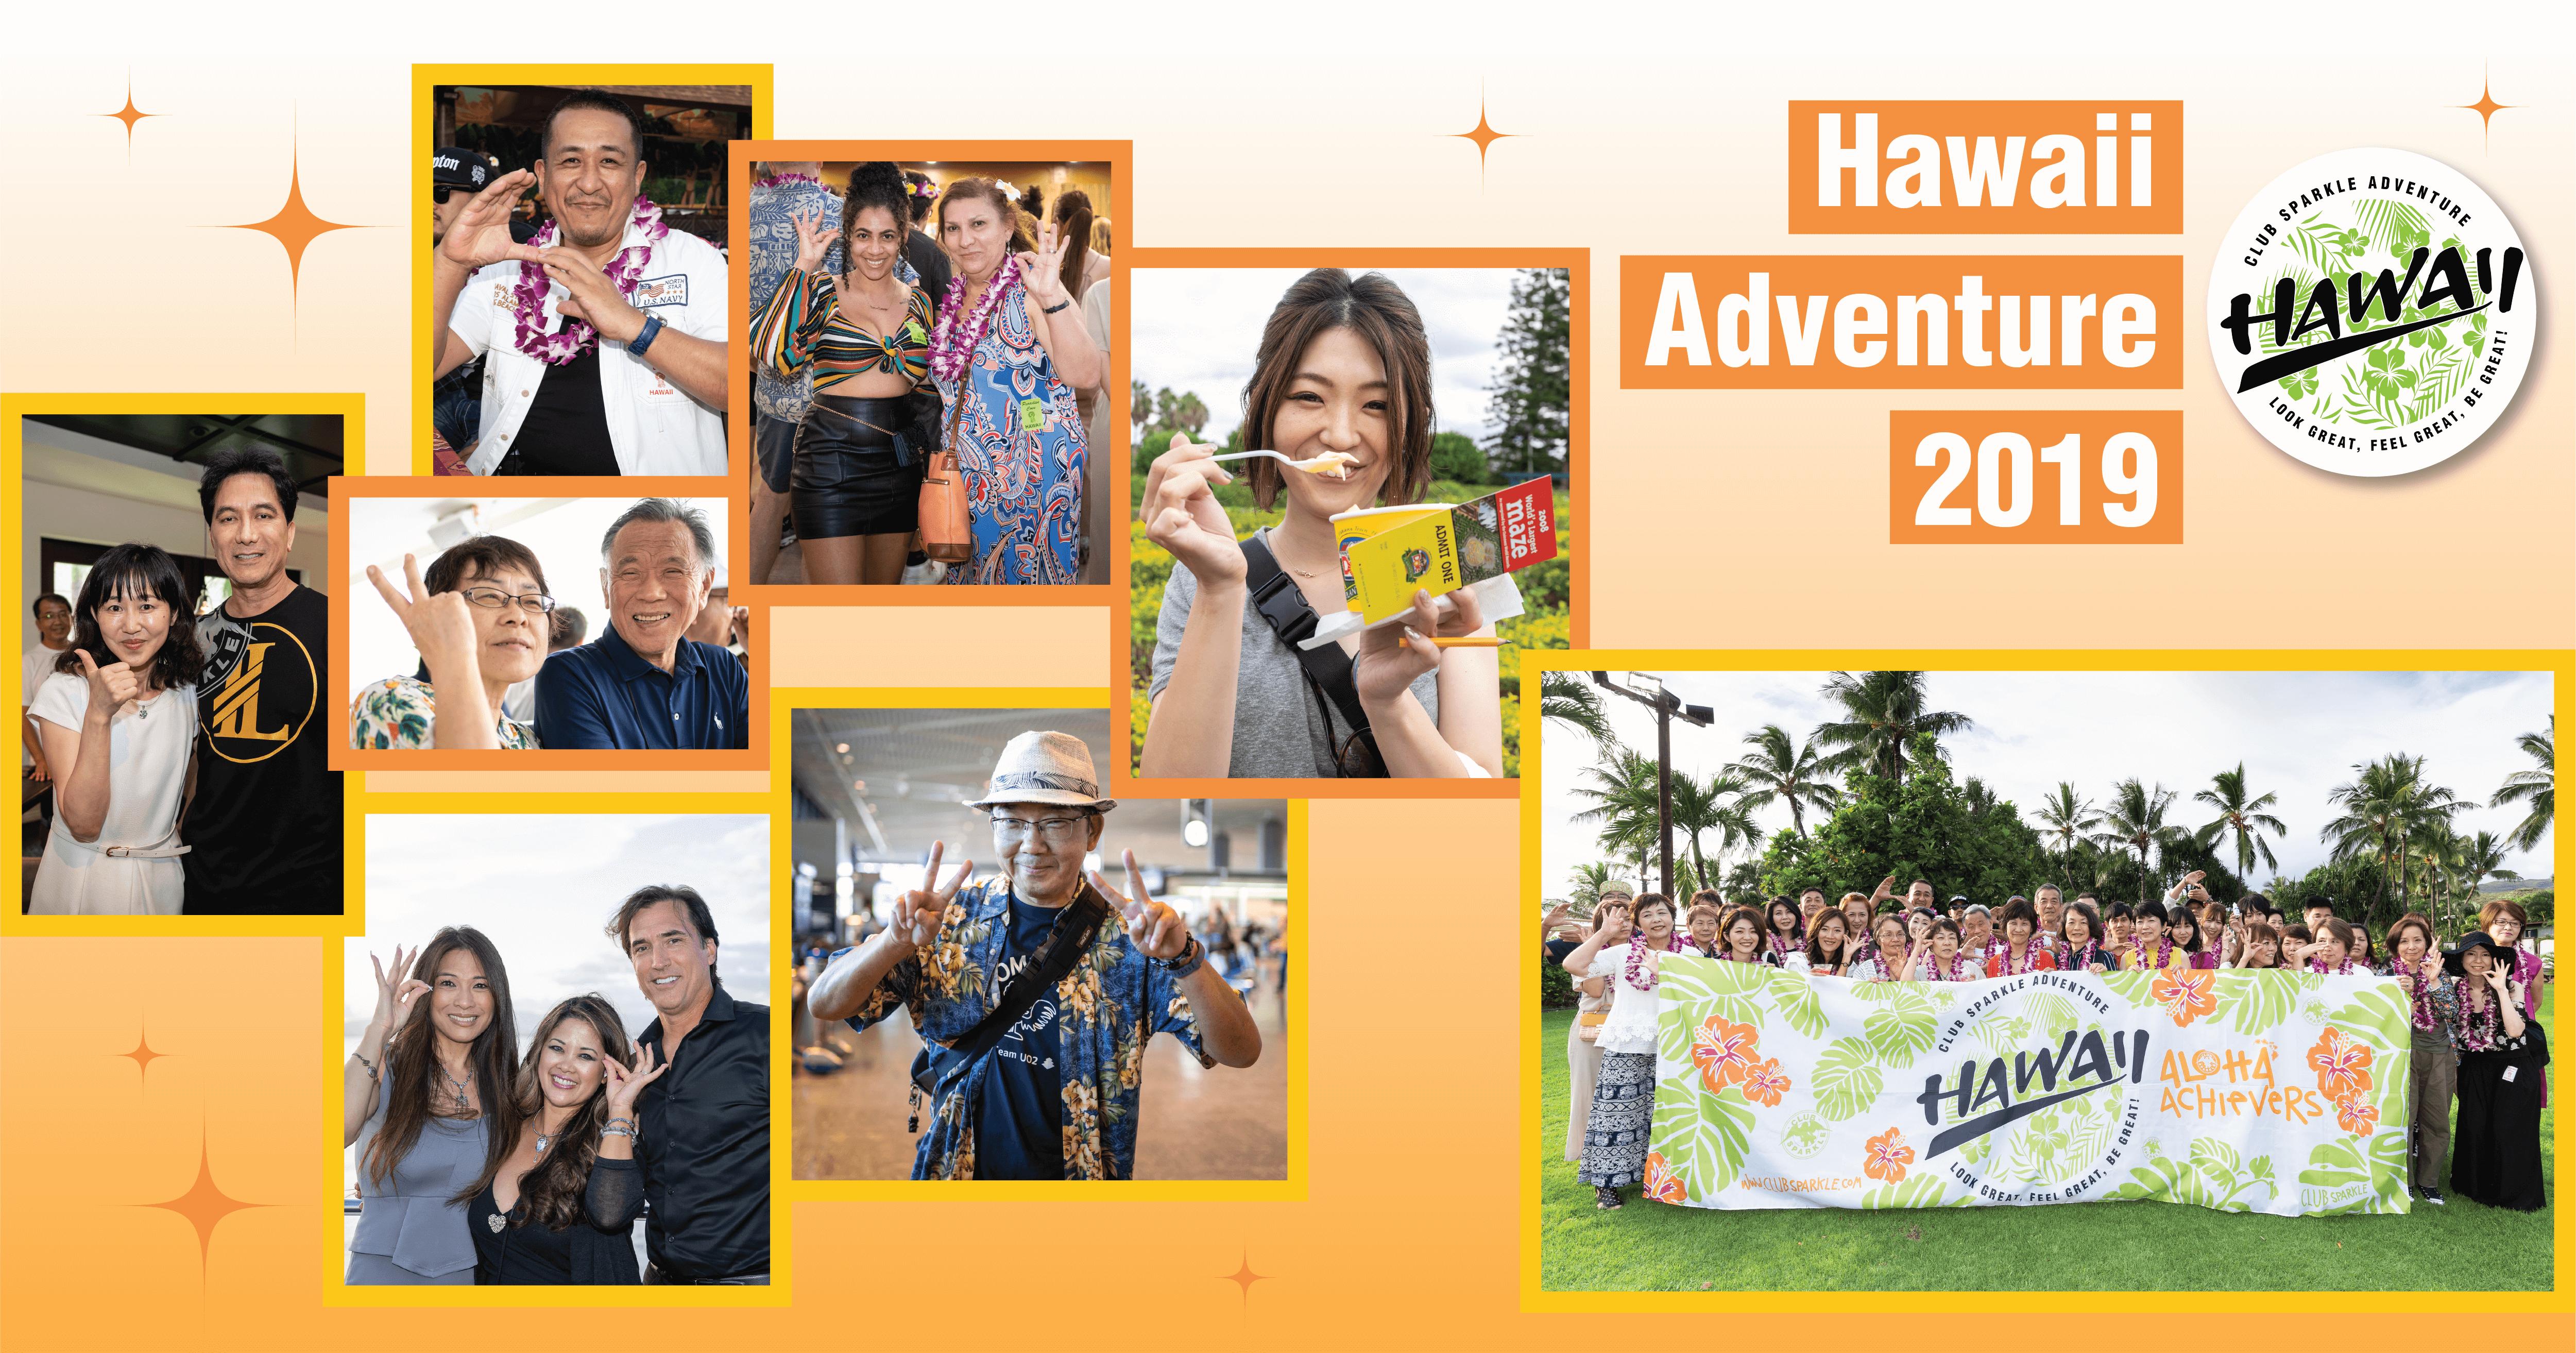 Hawaii Adventure 2019 collage